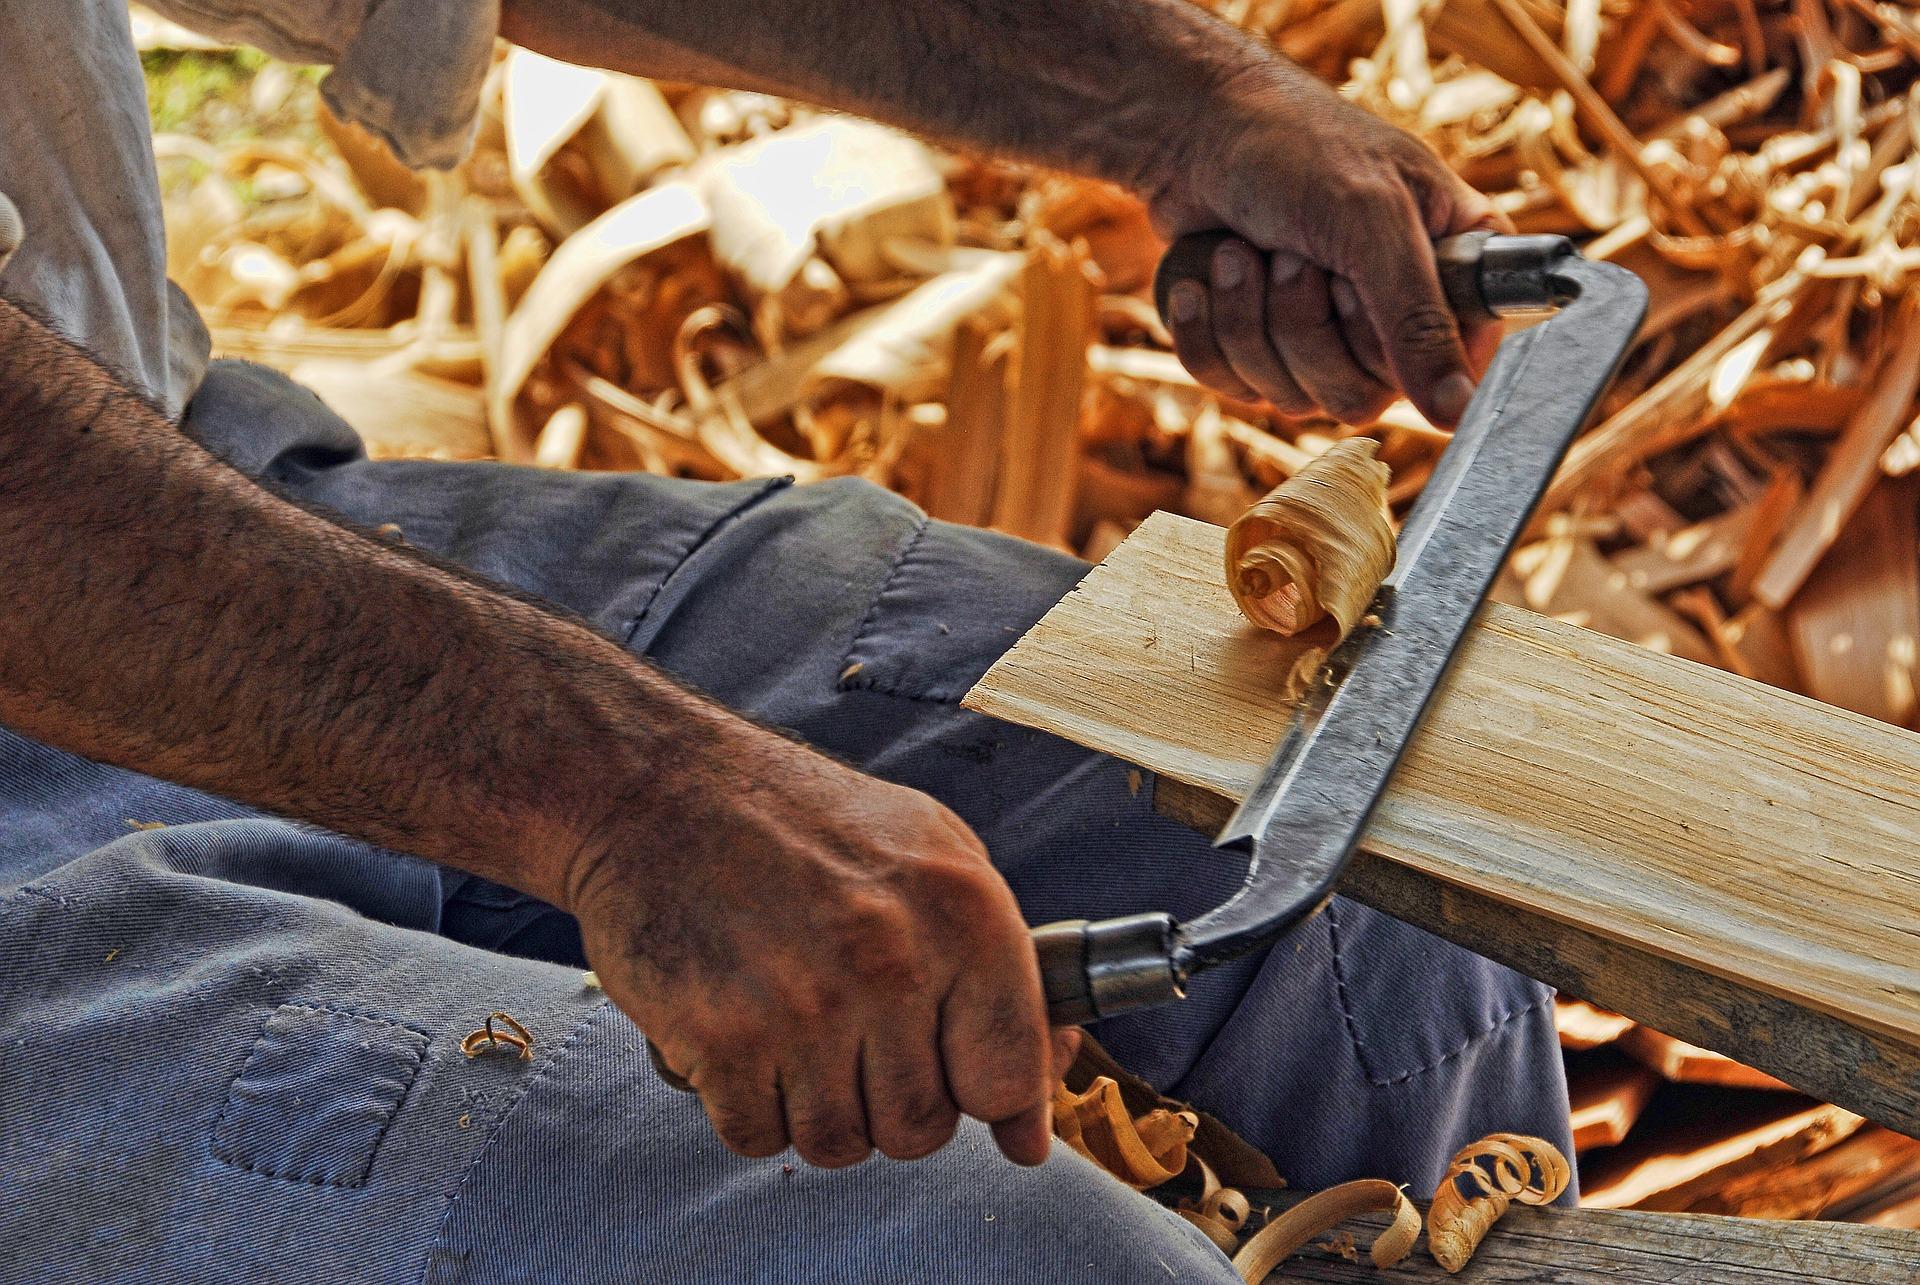 wood-working-2385634_1920.jpg